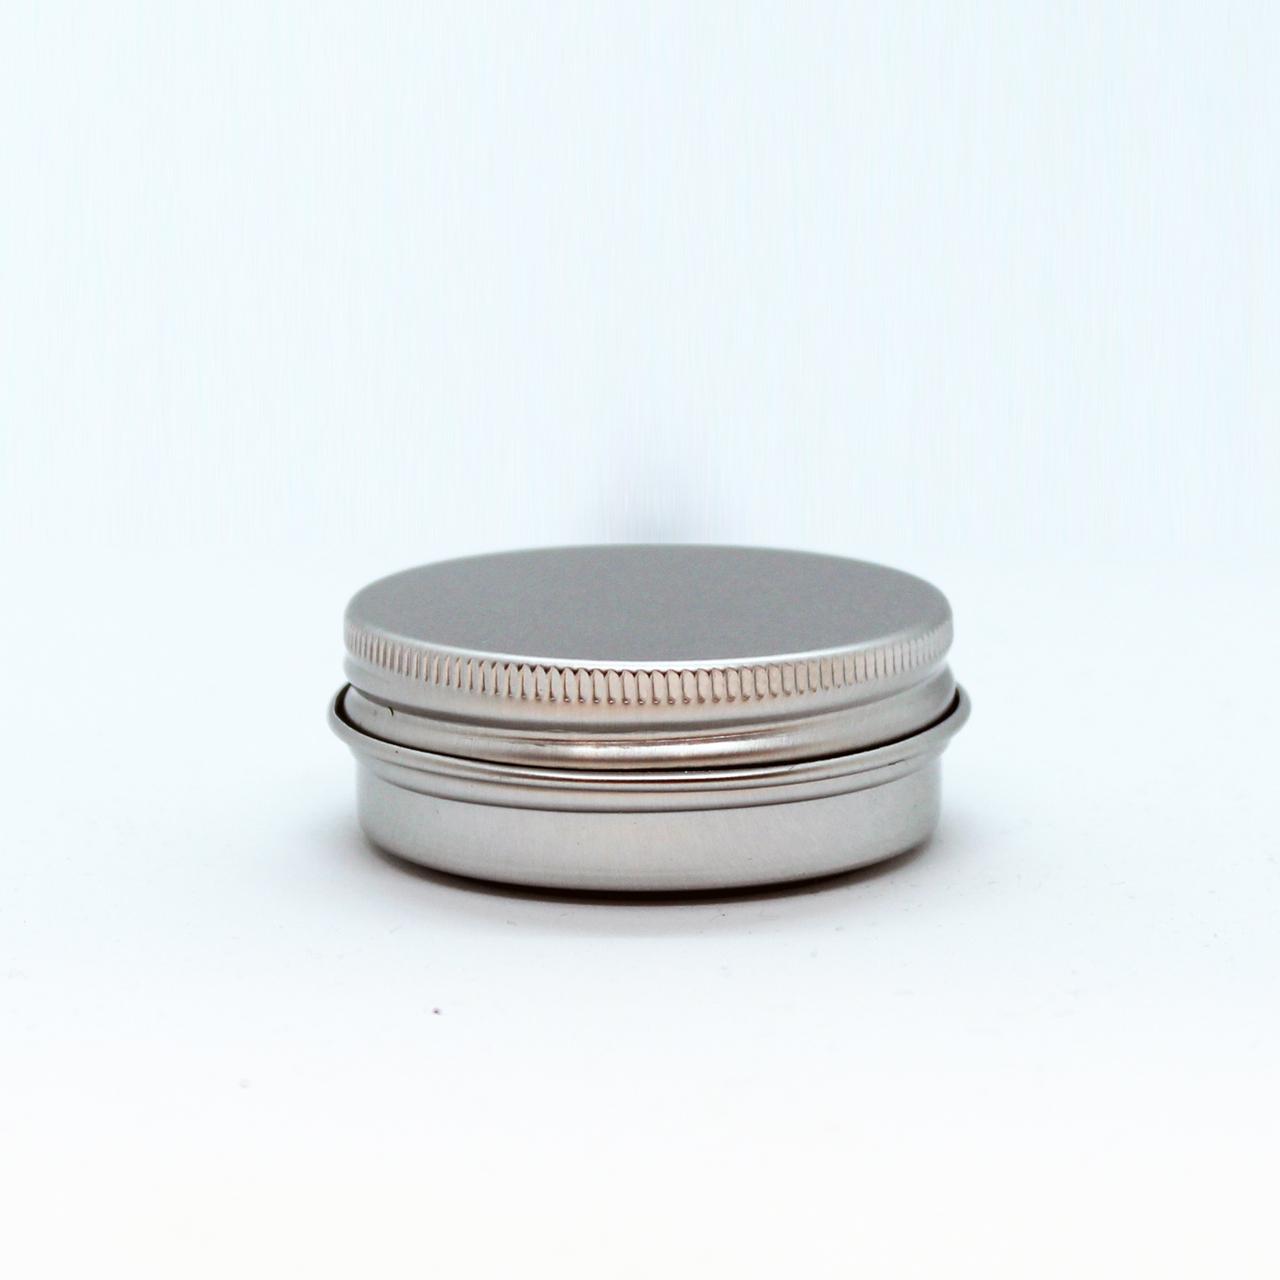 Aluminum Can 15g 5 pieces